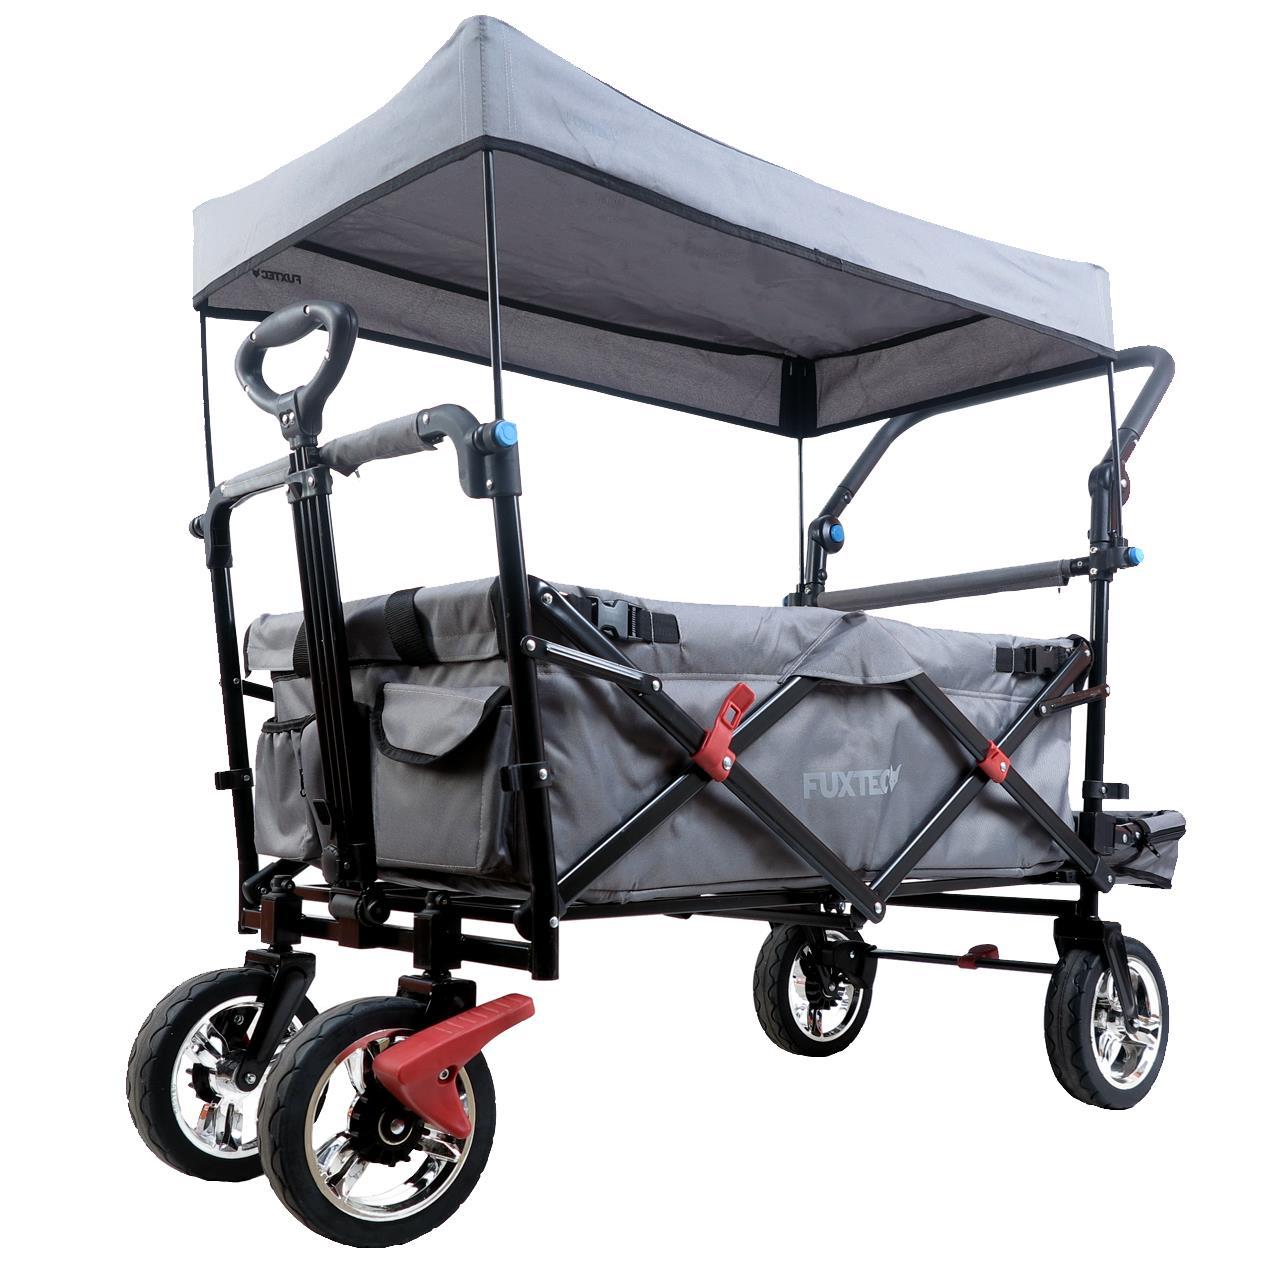 FUXTEC Bollerwagen FX-CT800 mit UV-geschütztem Sonnendach,Schiebegriff & Innenraumverlängerung